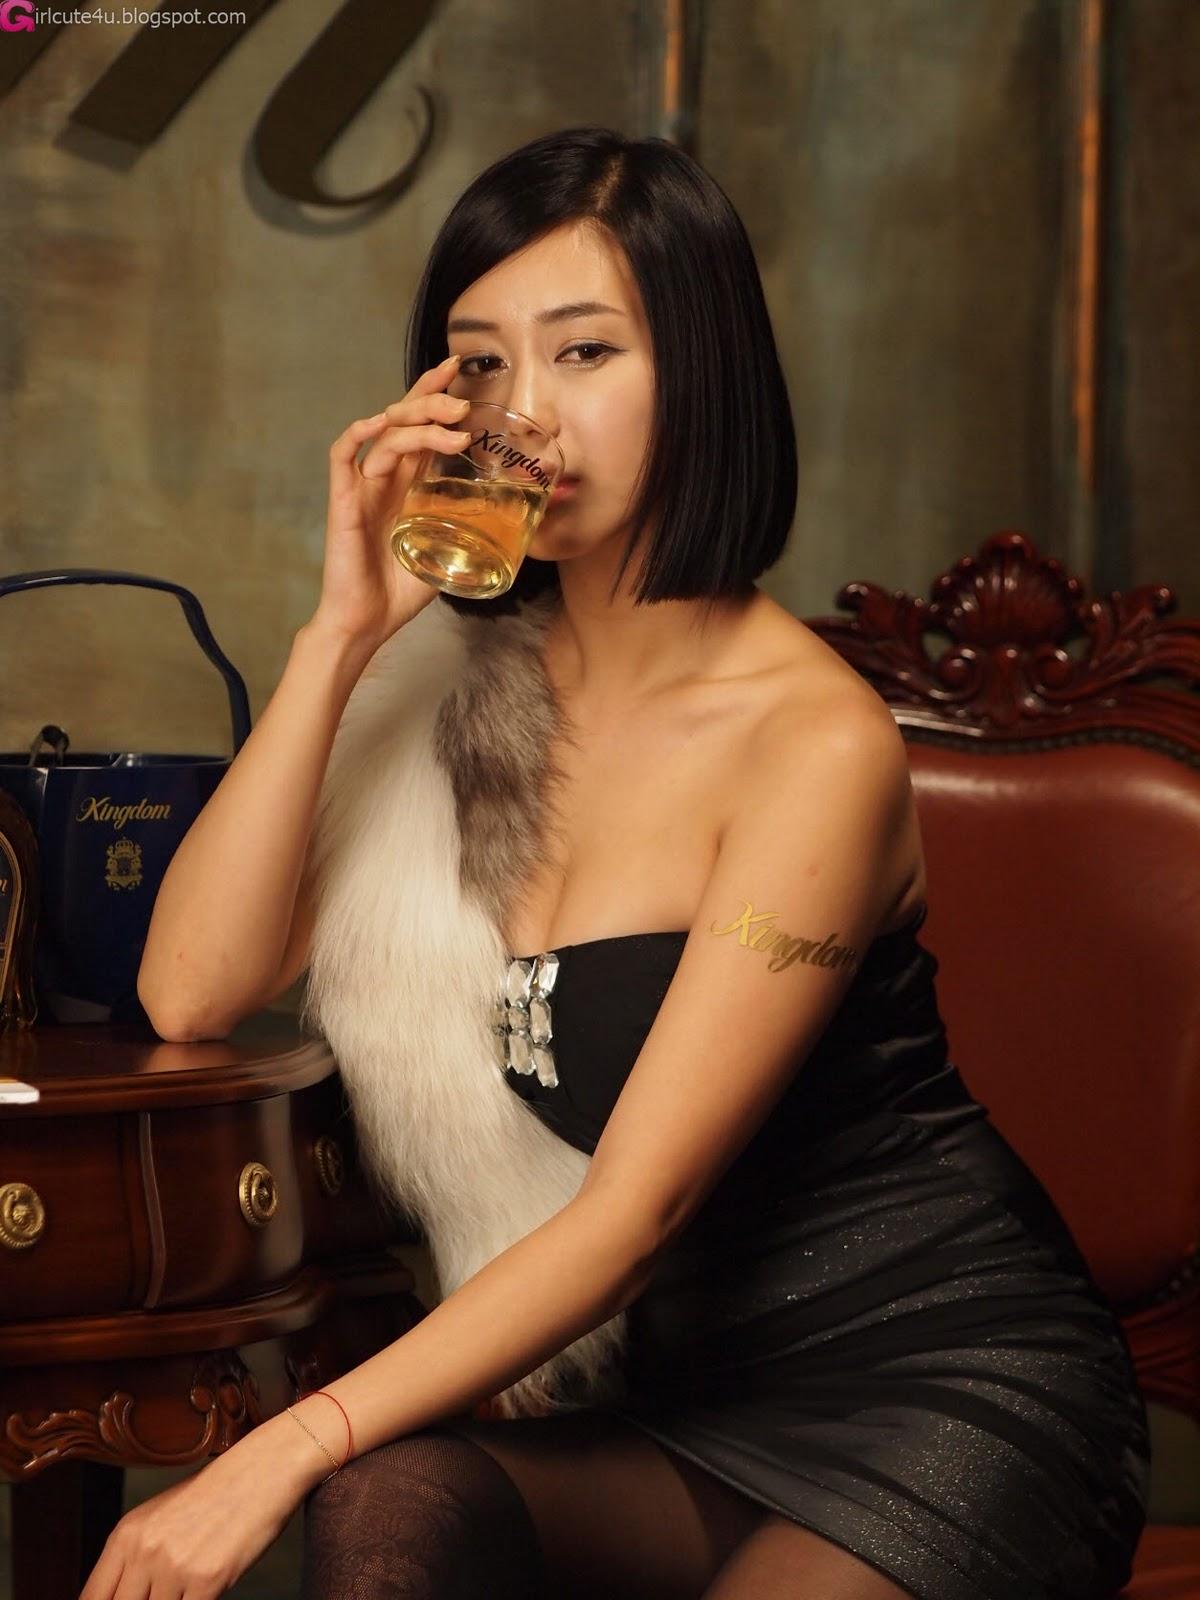 xxx nude girls: Ju Da Ha in Wedding Dress